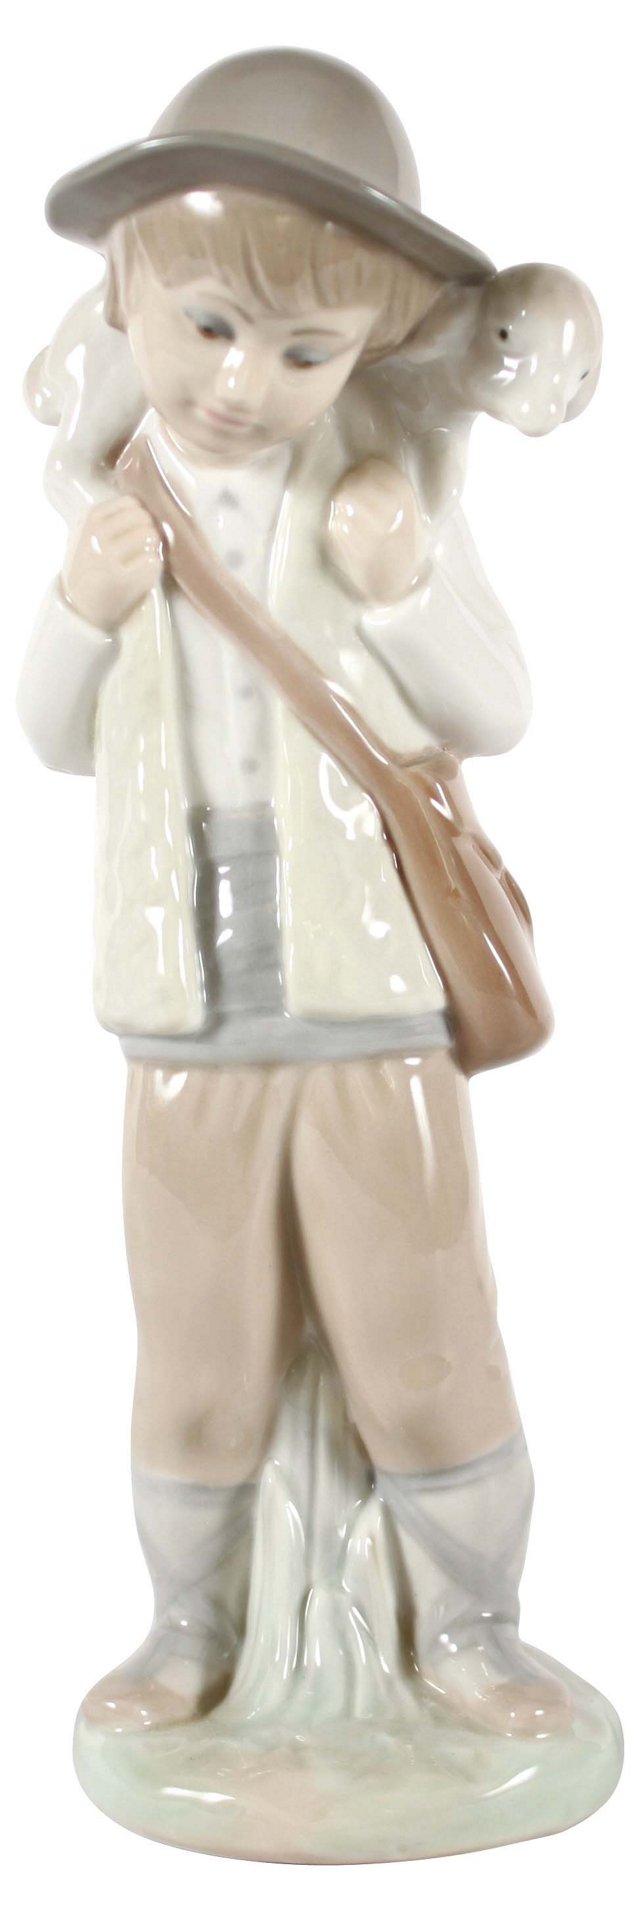 Boy & Lamb Figurine by Zaphin of Spain